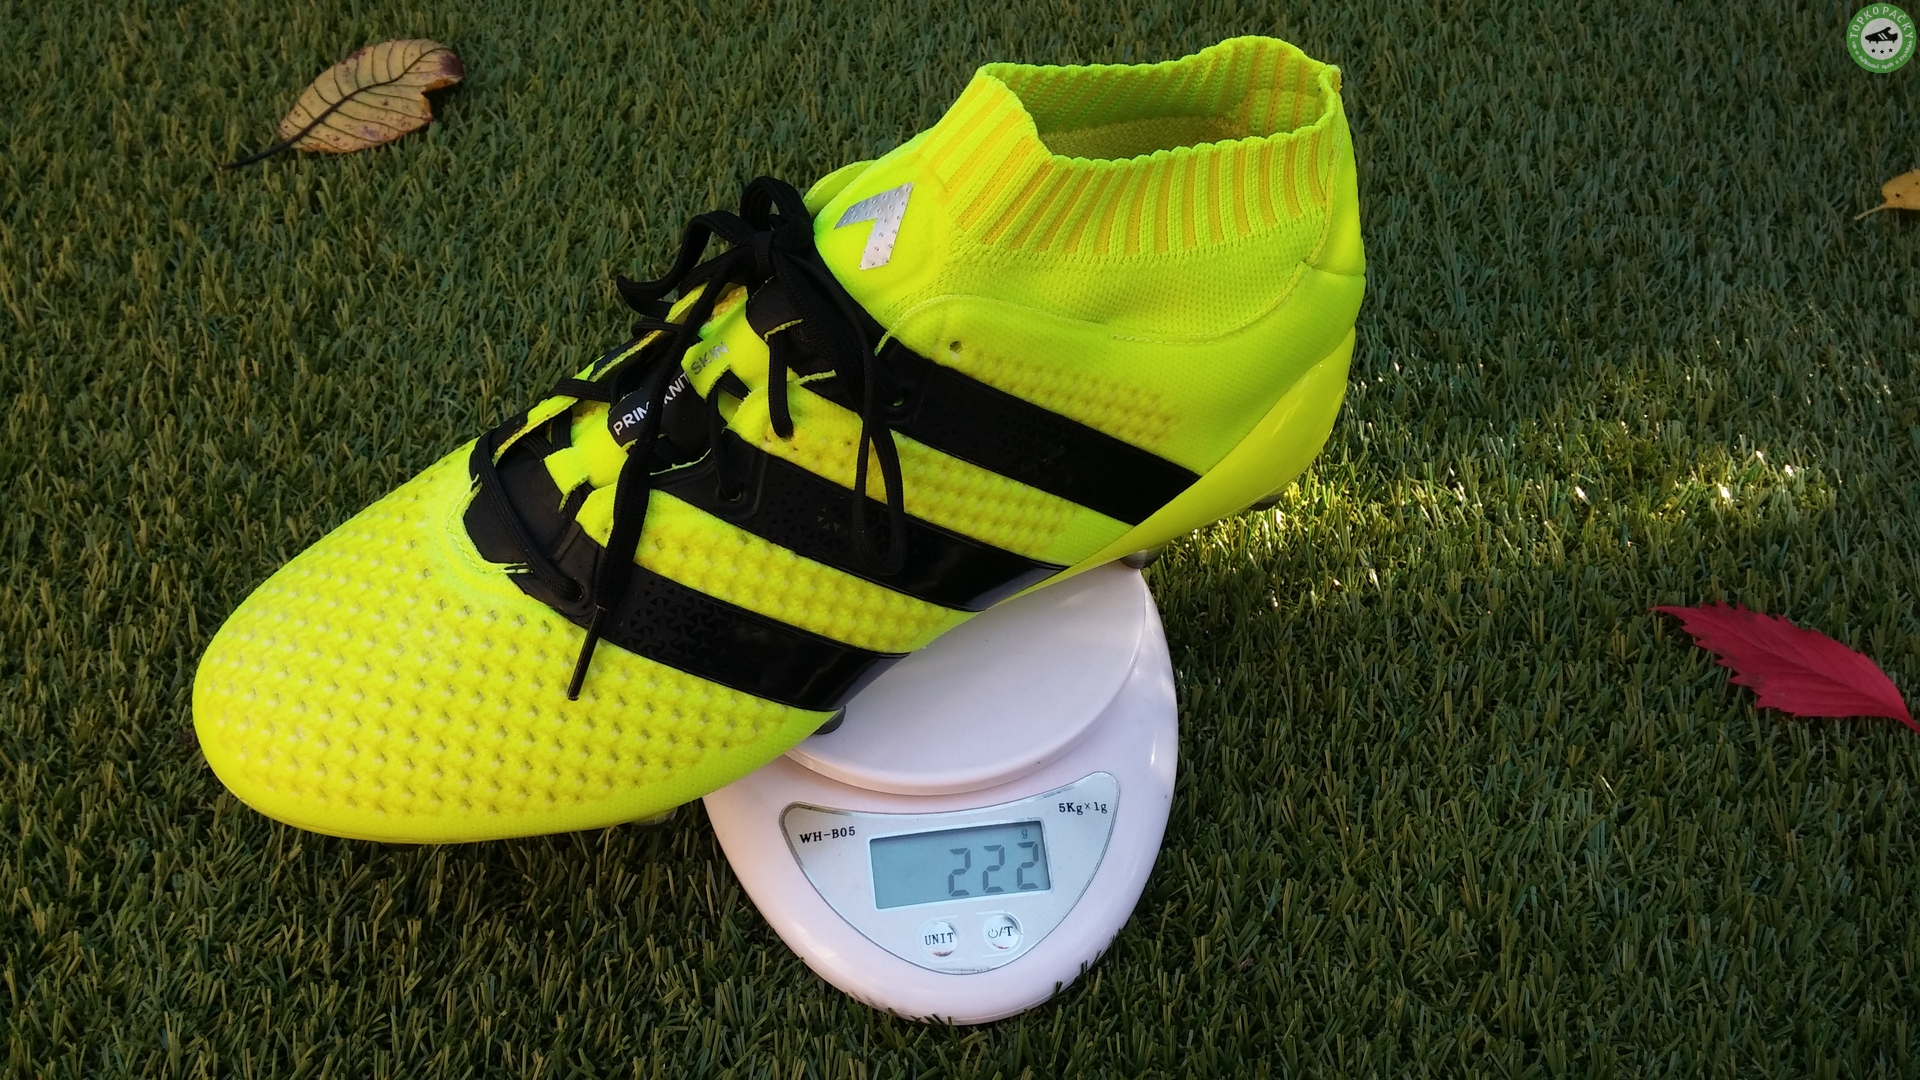 Adidas ACE 16.1 Primeknit váha